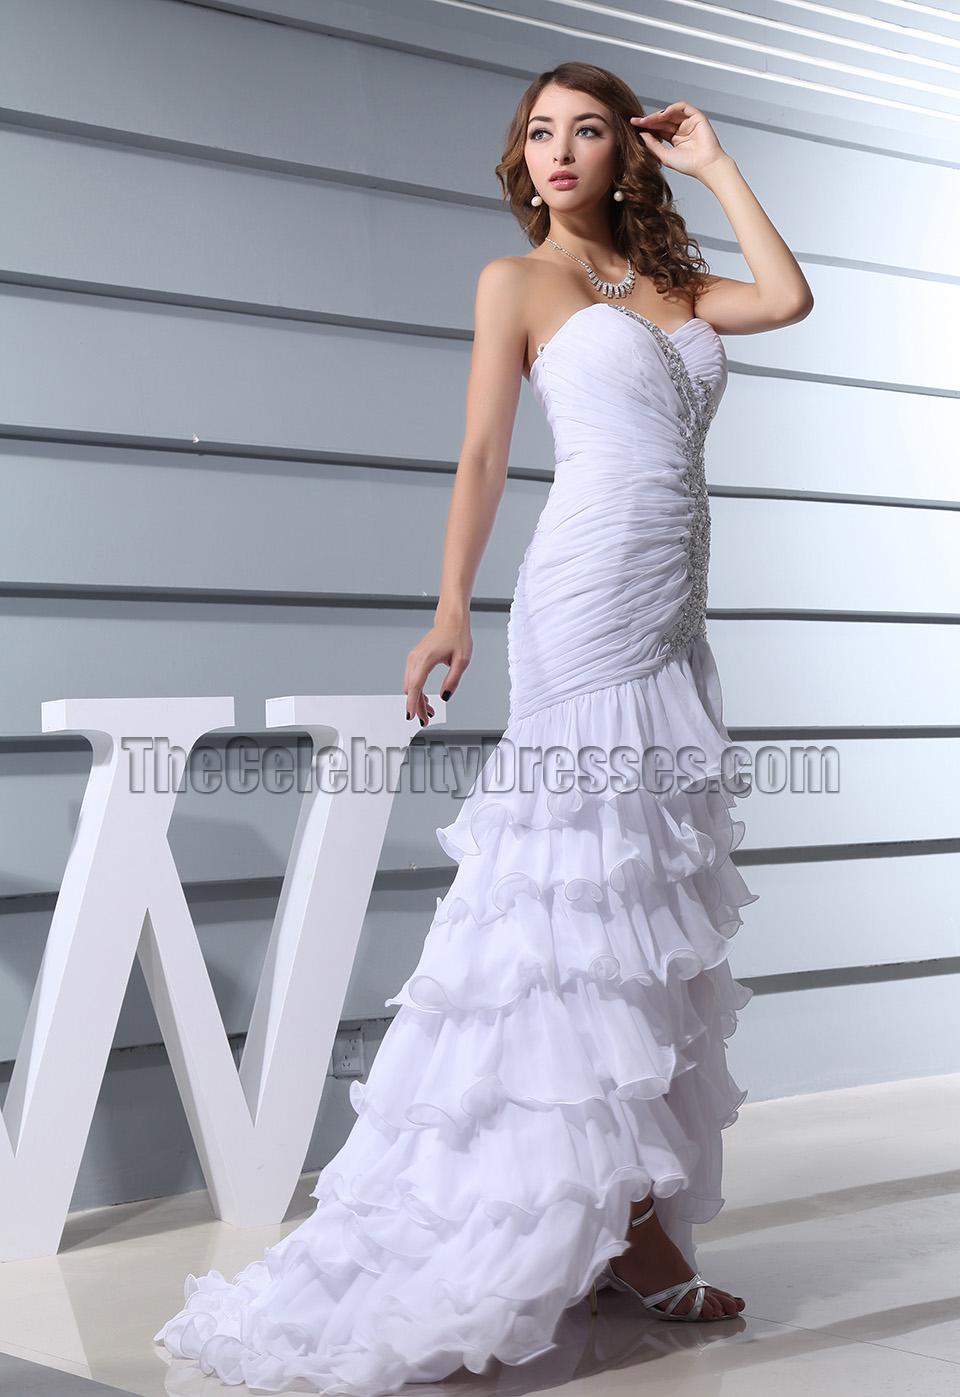 White Strapless Mermaid Evening Formal Prom Dresses ...